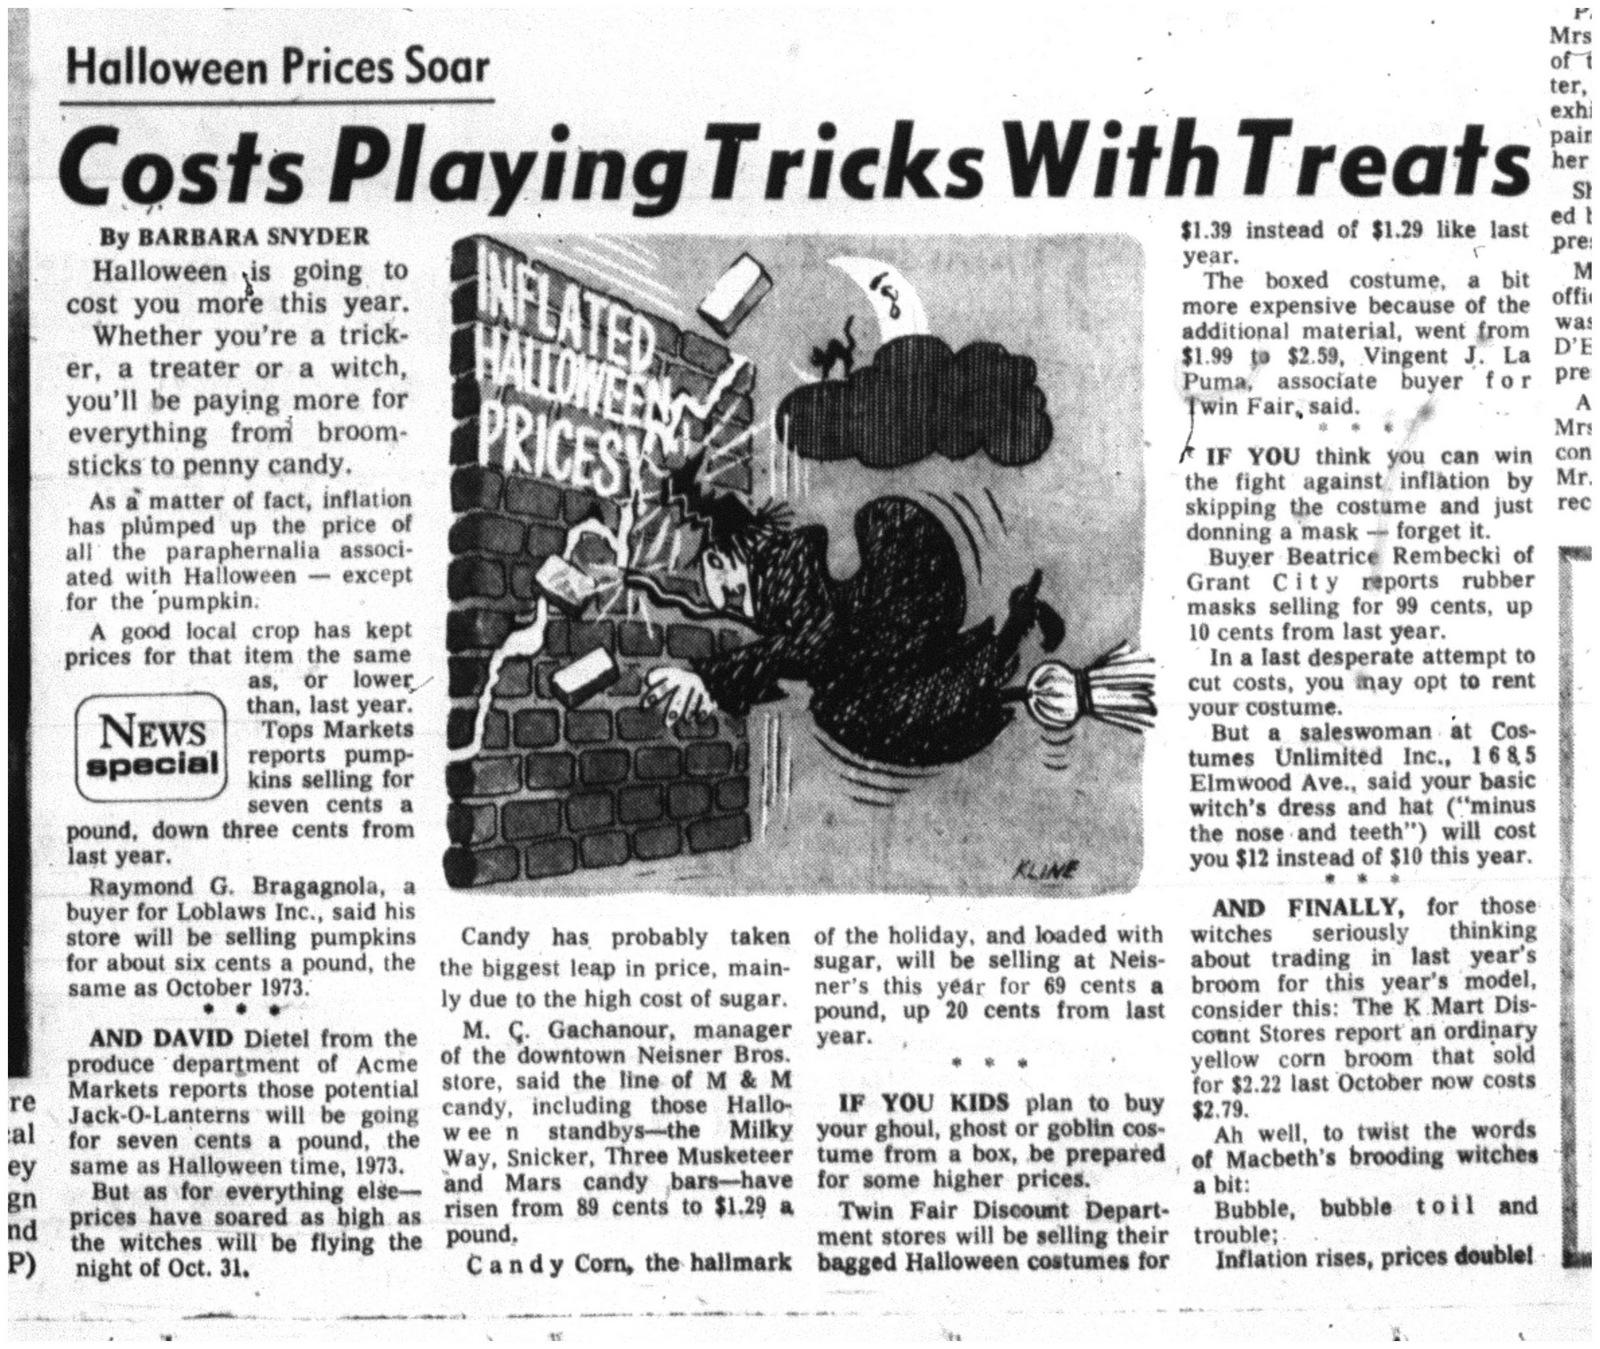 31 22 oct 1974 price of halloween soars